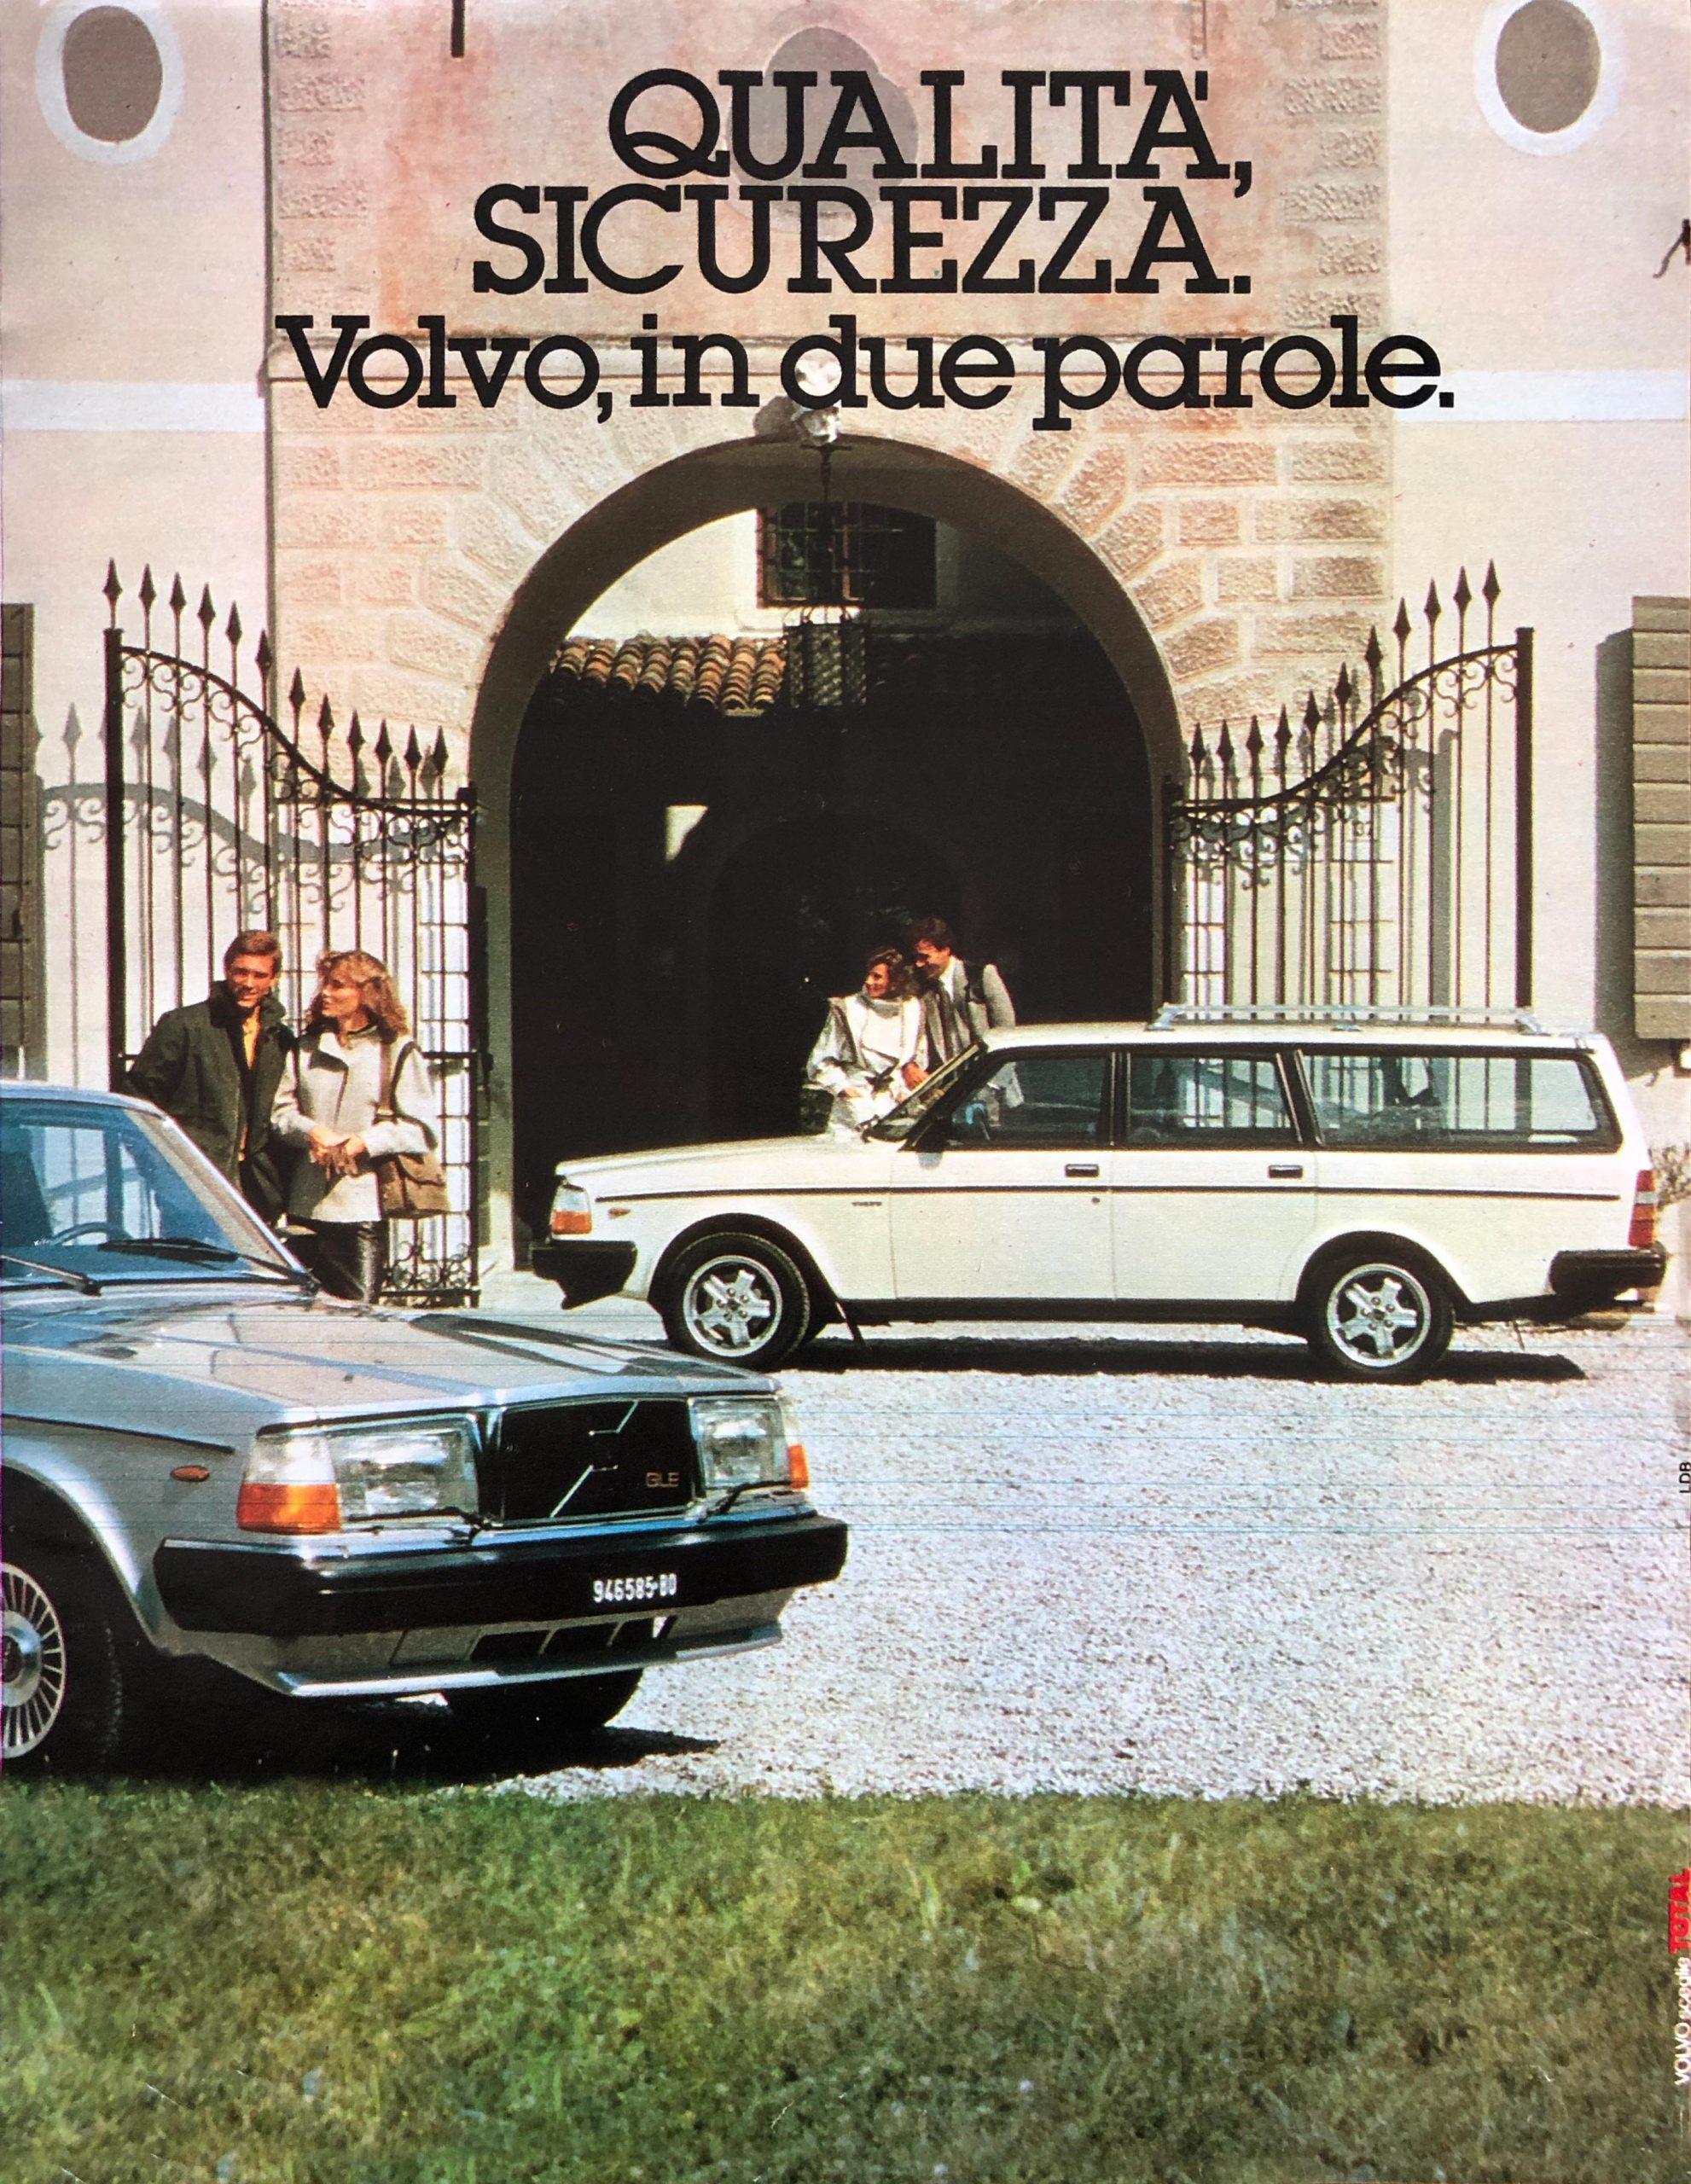 1983 Volvo 245 Turbo magazine ad italian